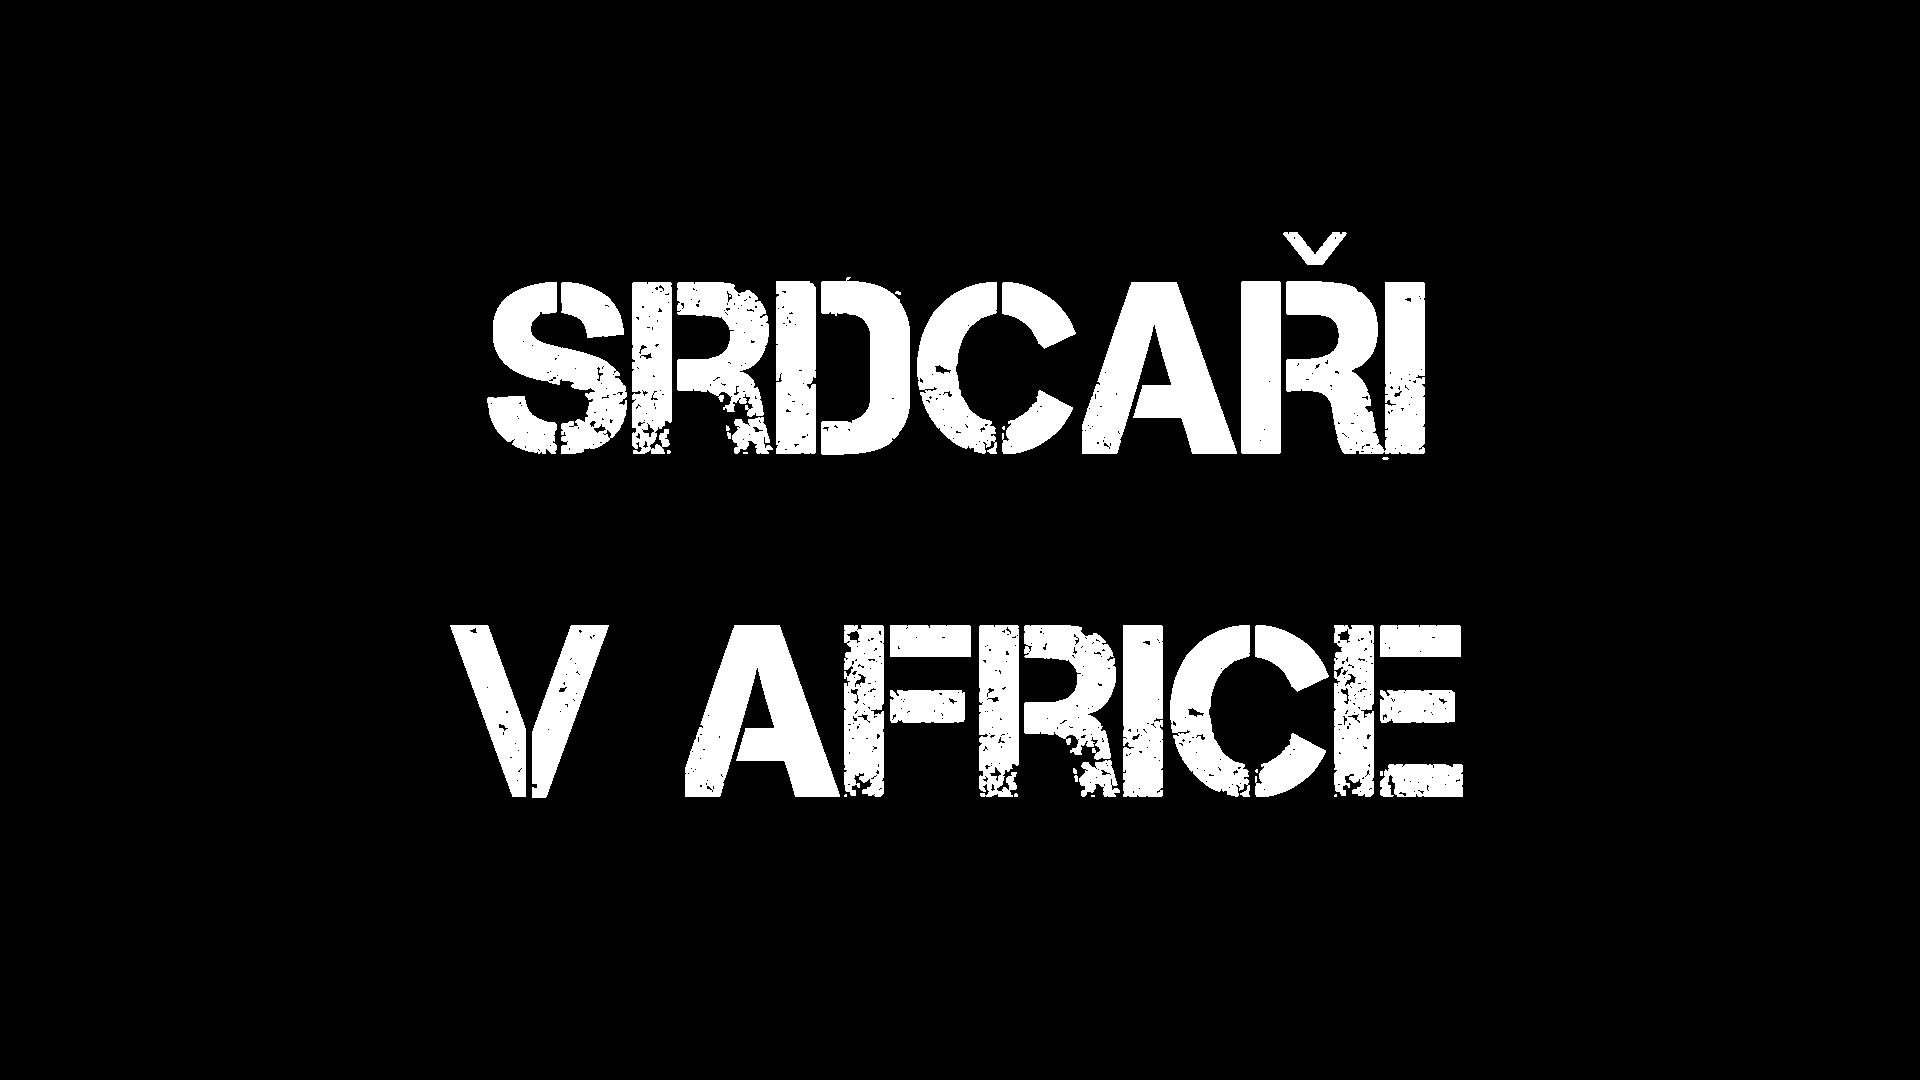 Srdcaři - Sdrdcaři v Africe nadpis